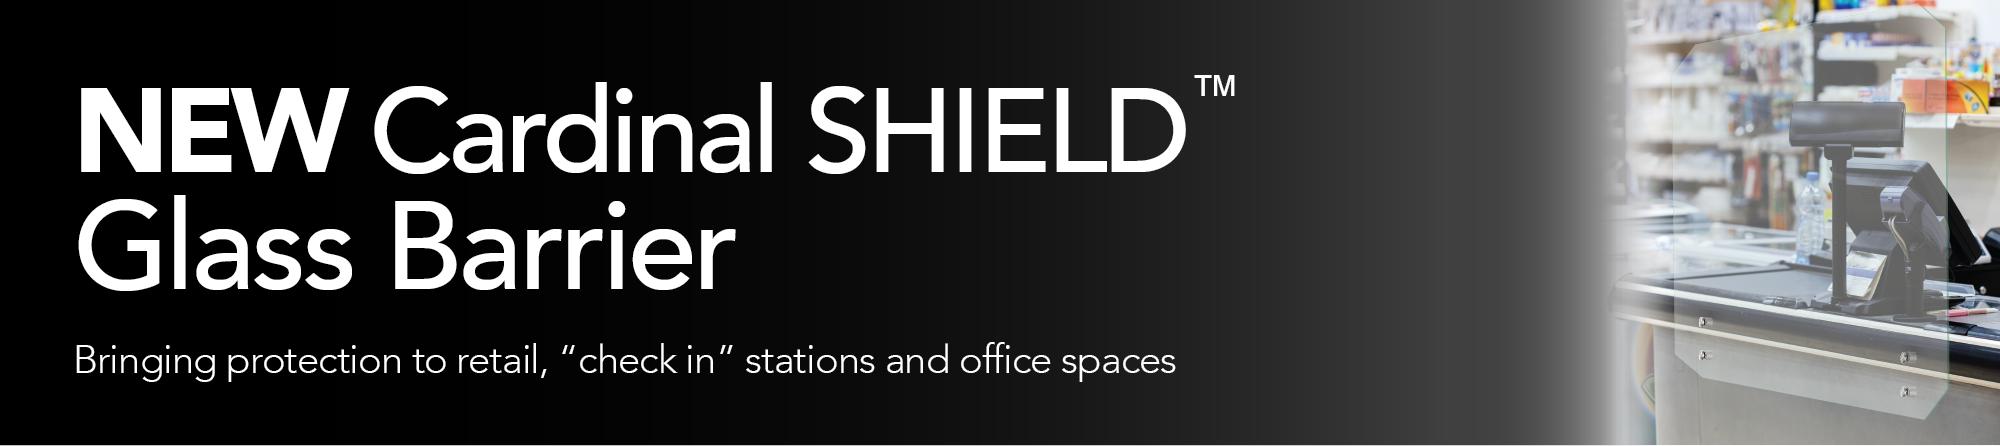 Cardinal Shield